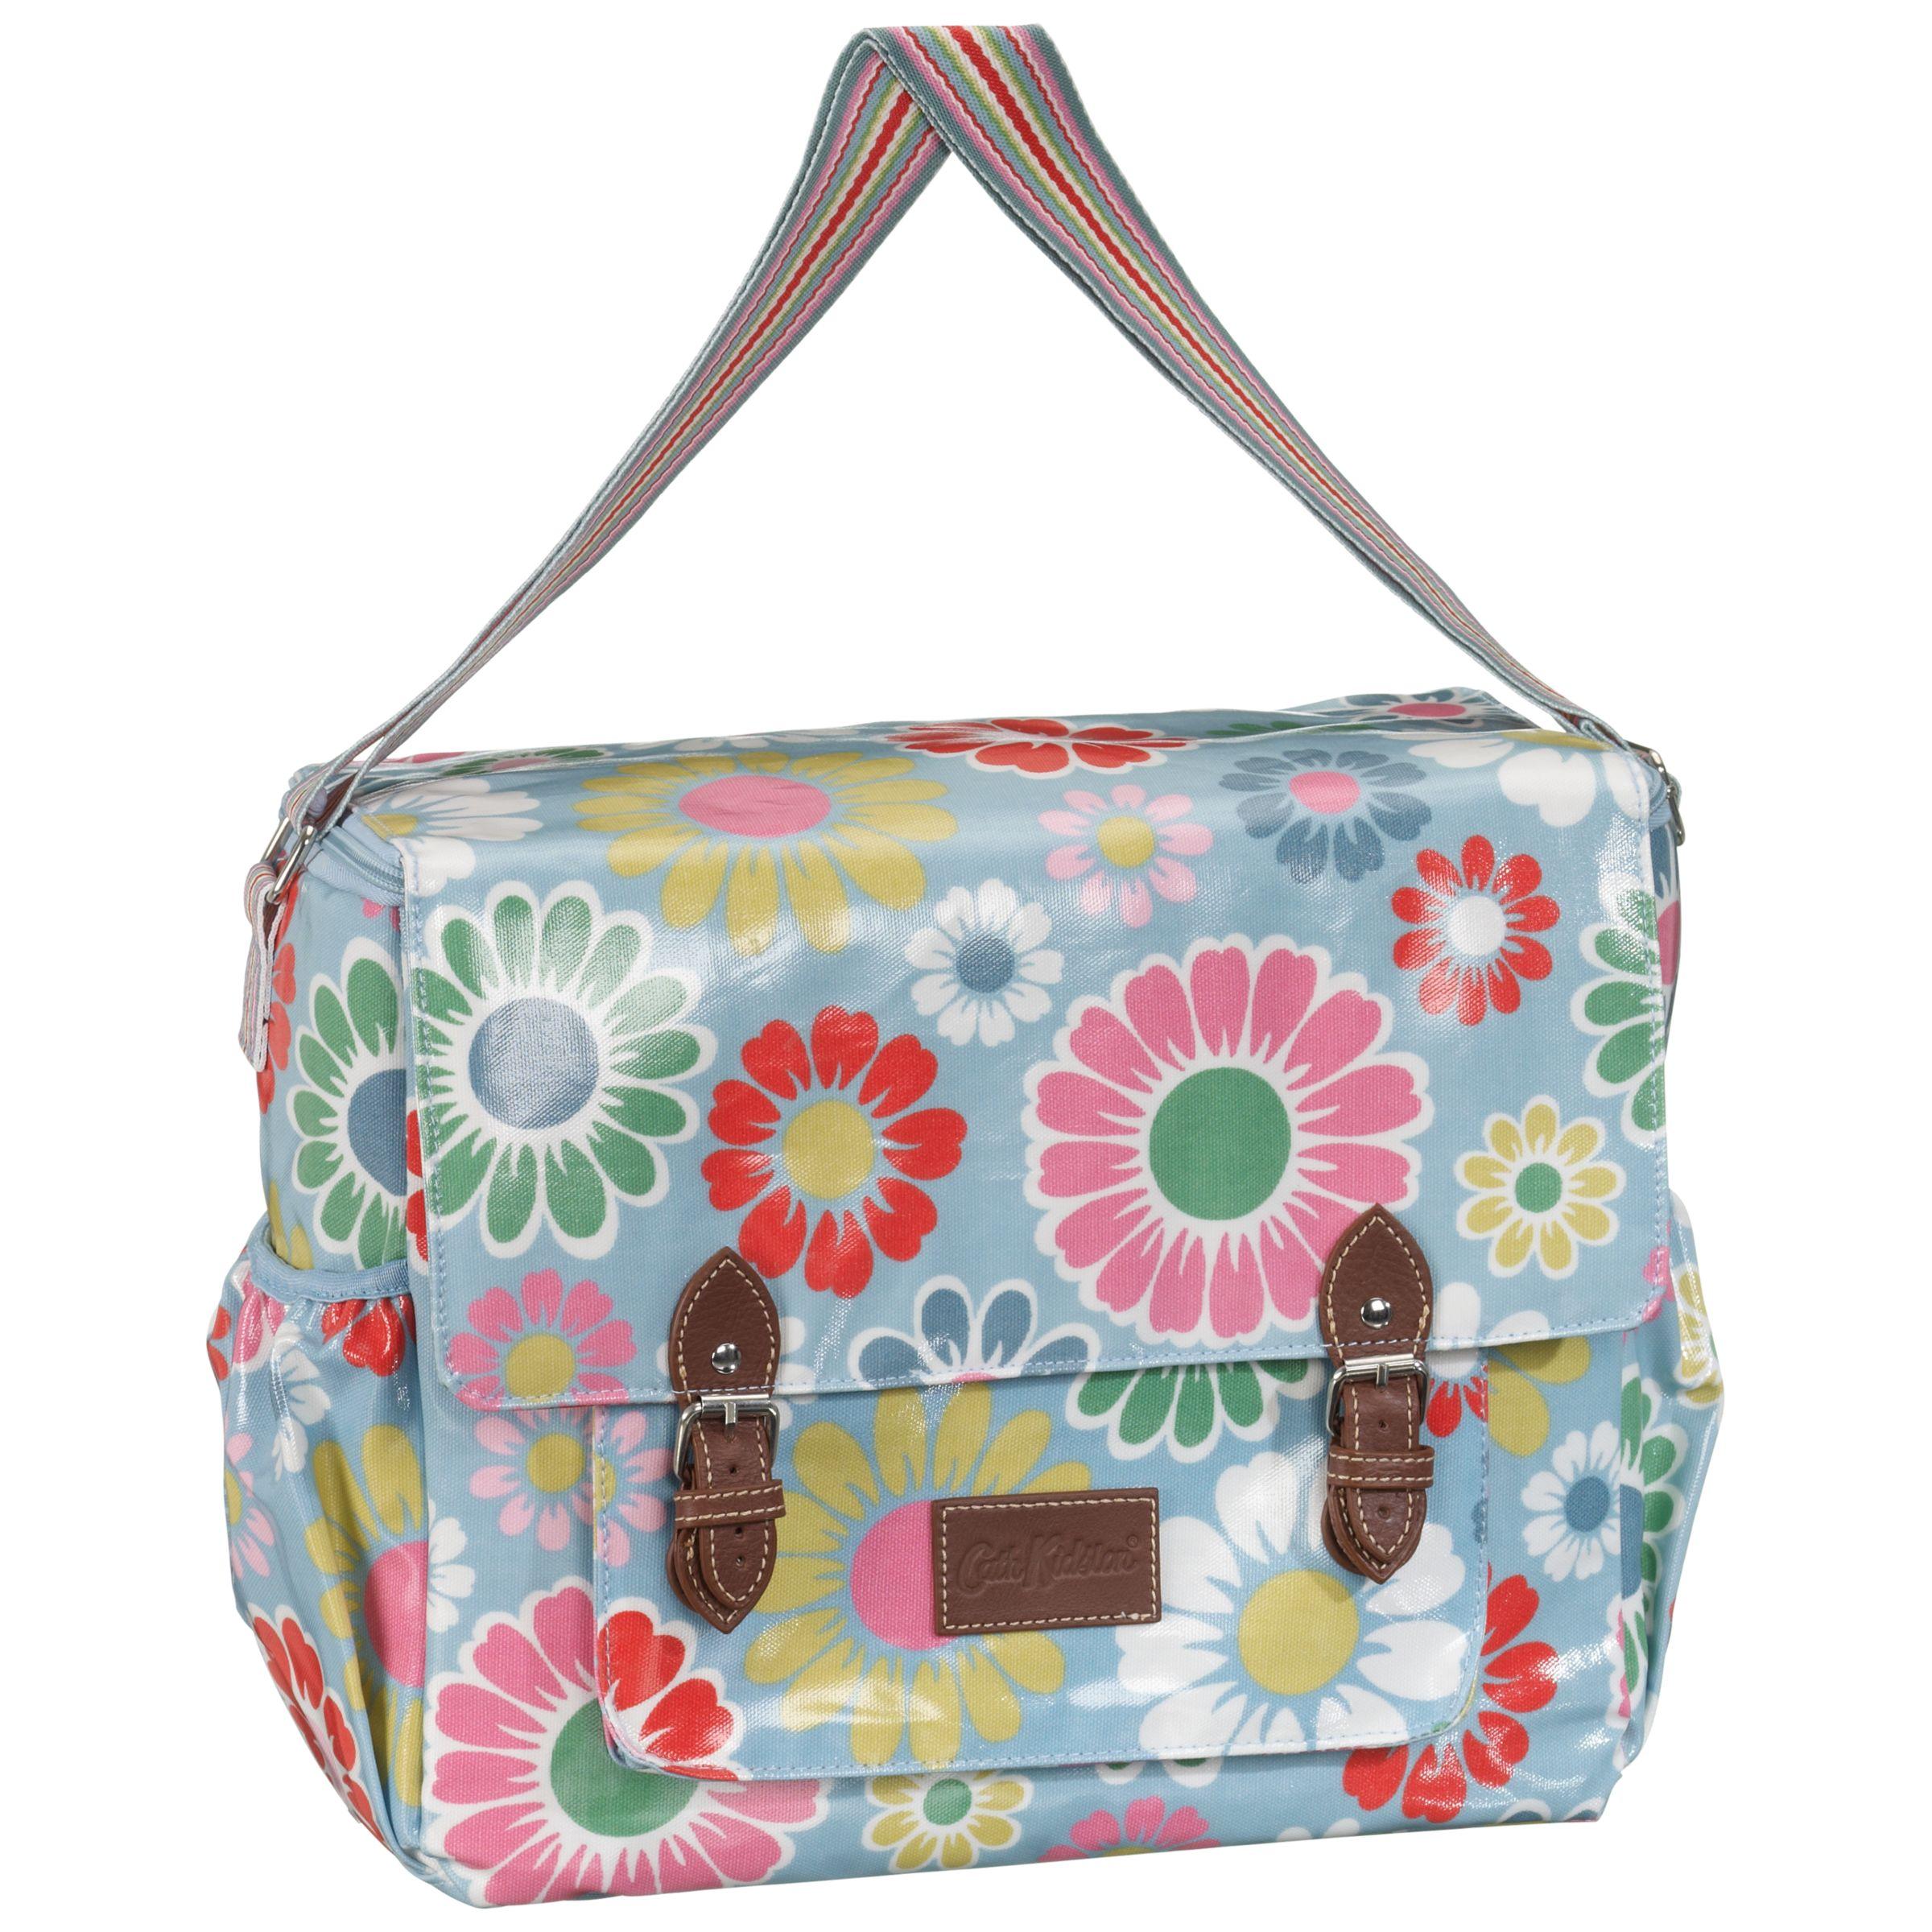 Cath Kidston Cool Bag